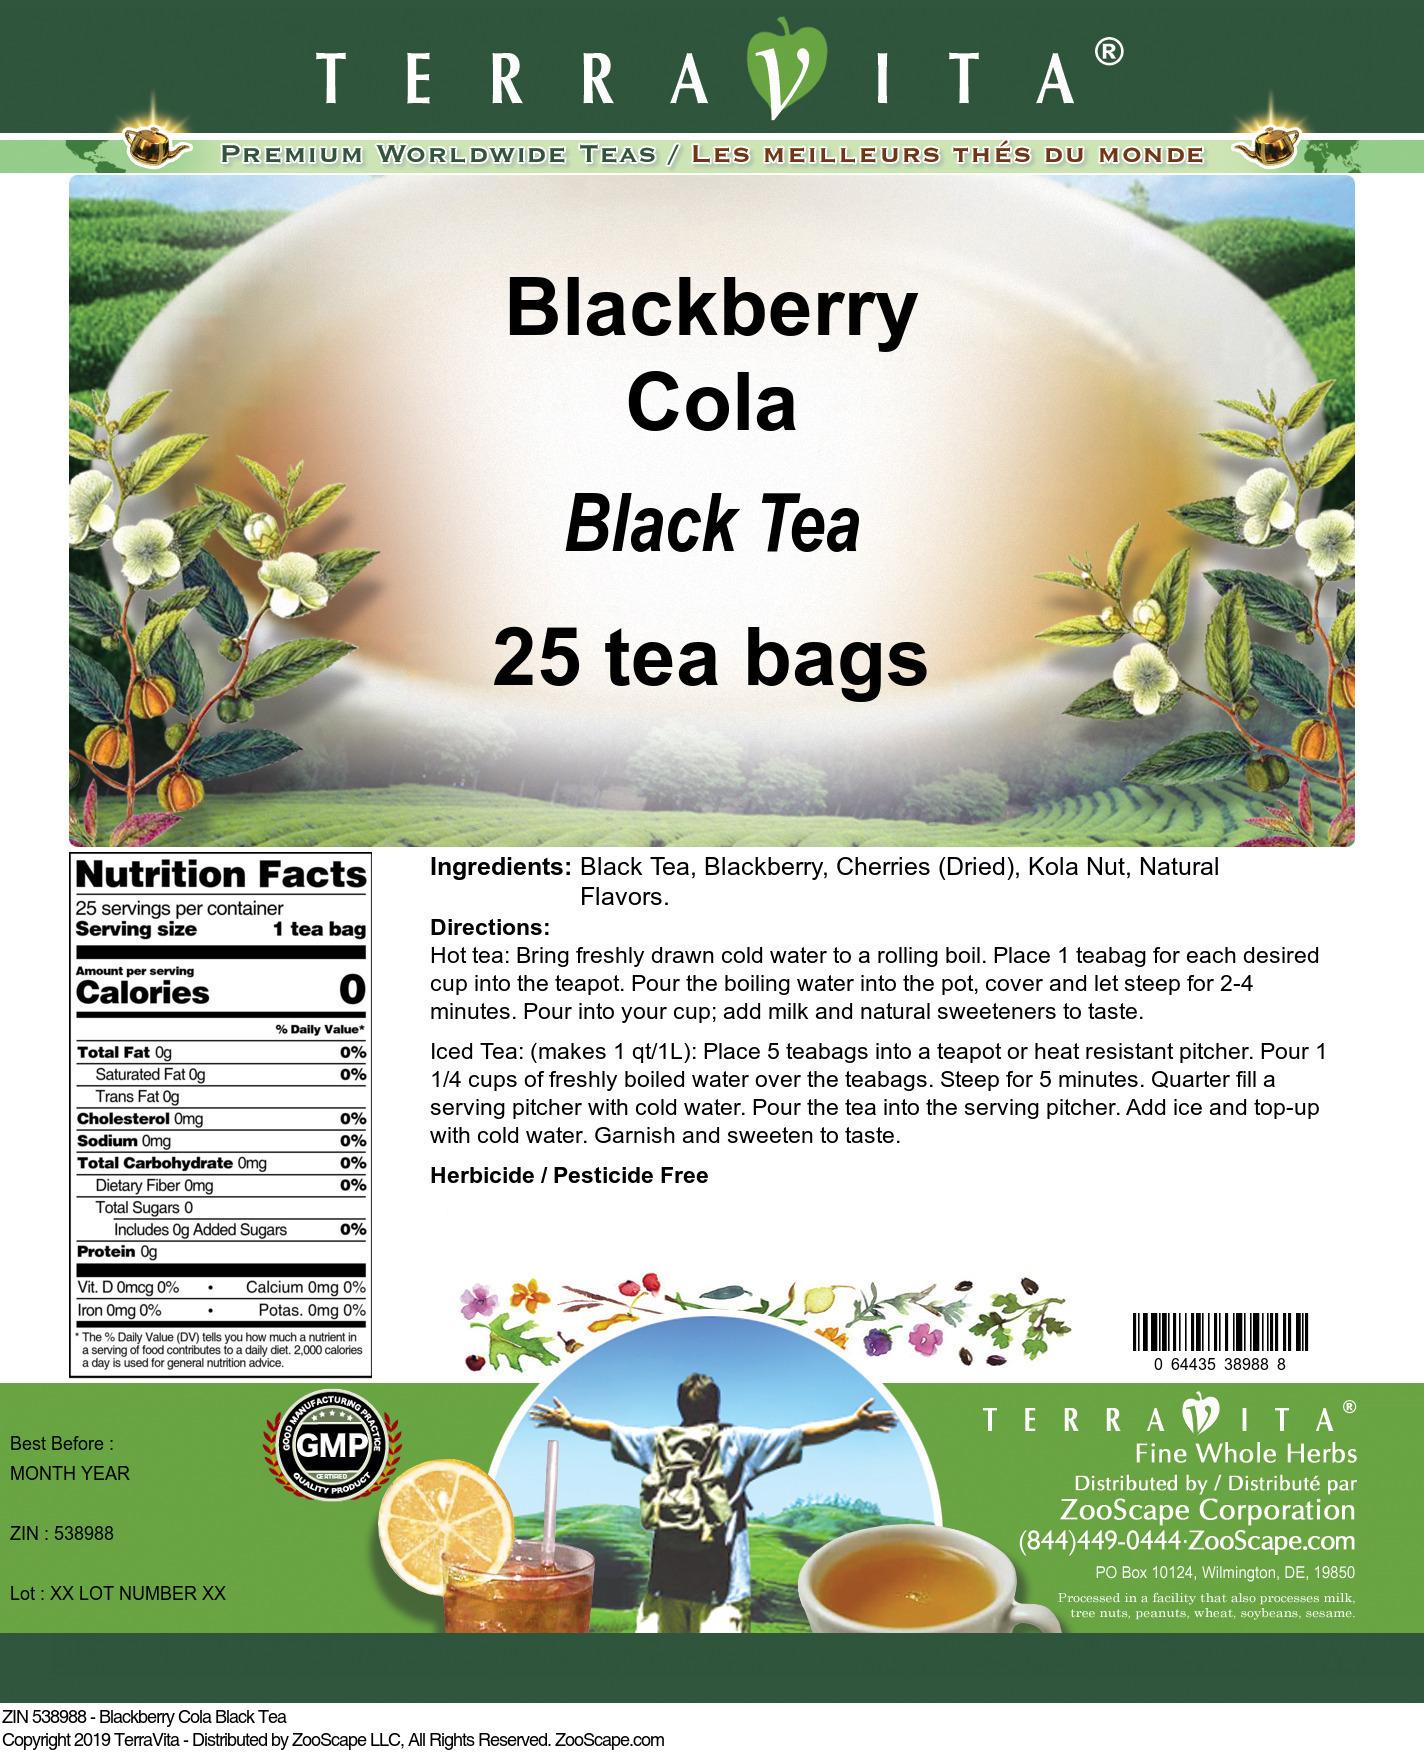 Blackberry Cola Black Tea